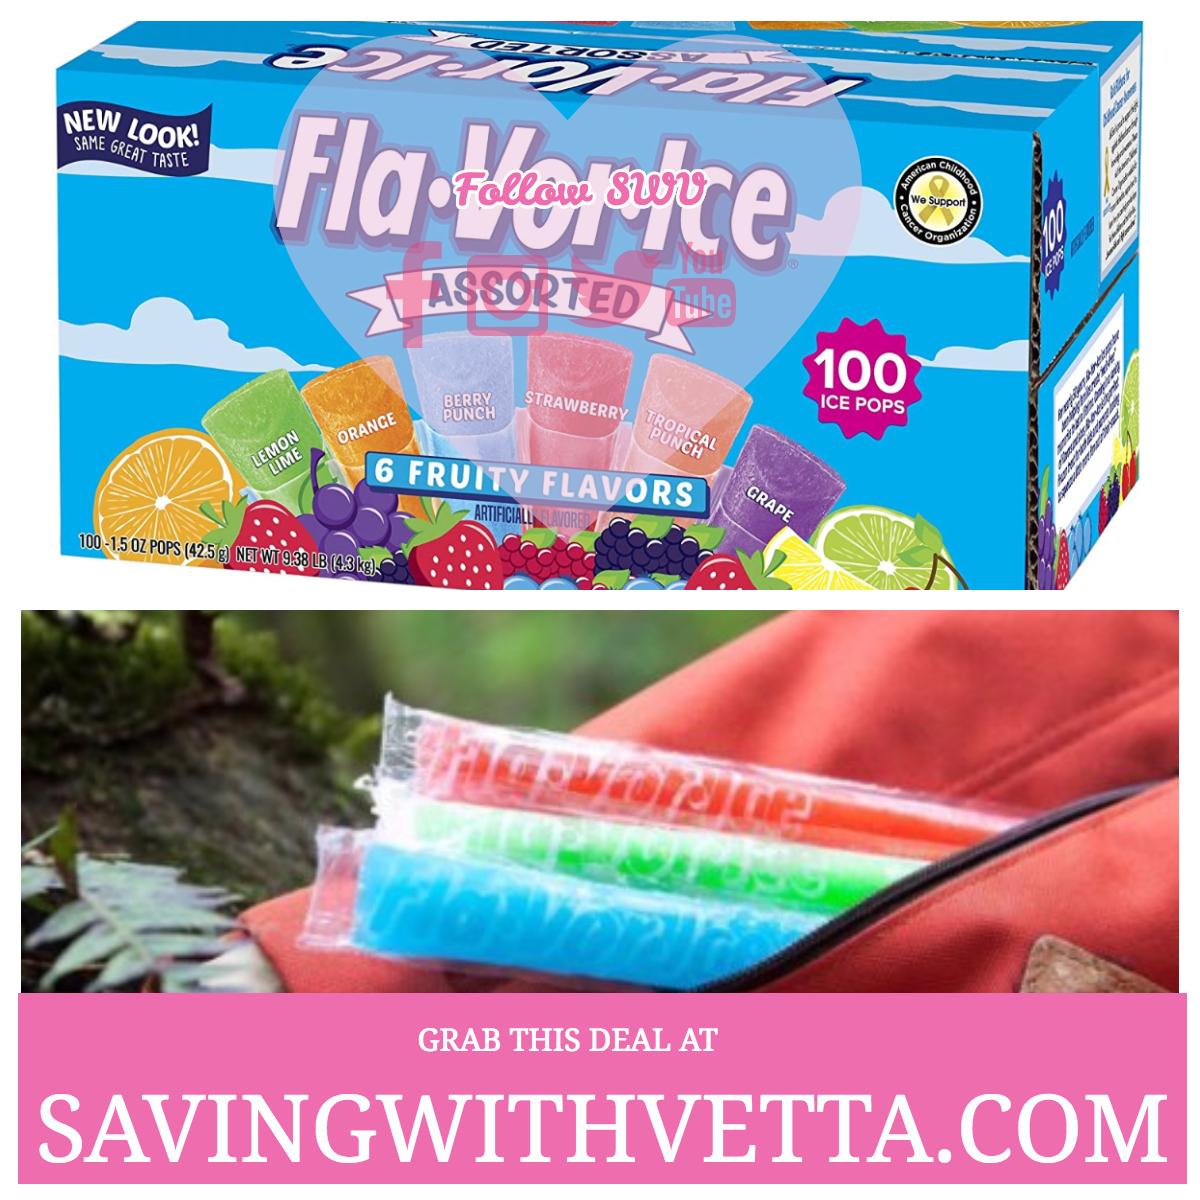 Fla-Vor-Ice Freezer Pops, Gluten & Fat Free Ice Pops ...